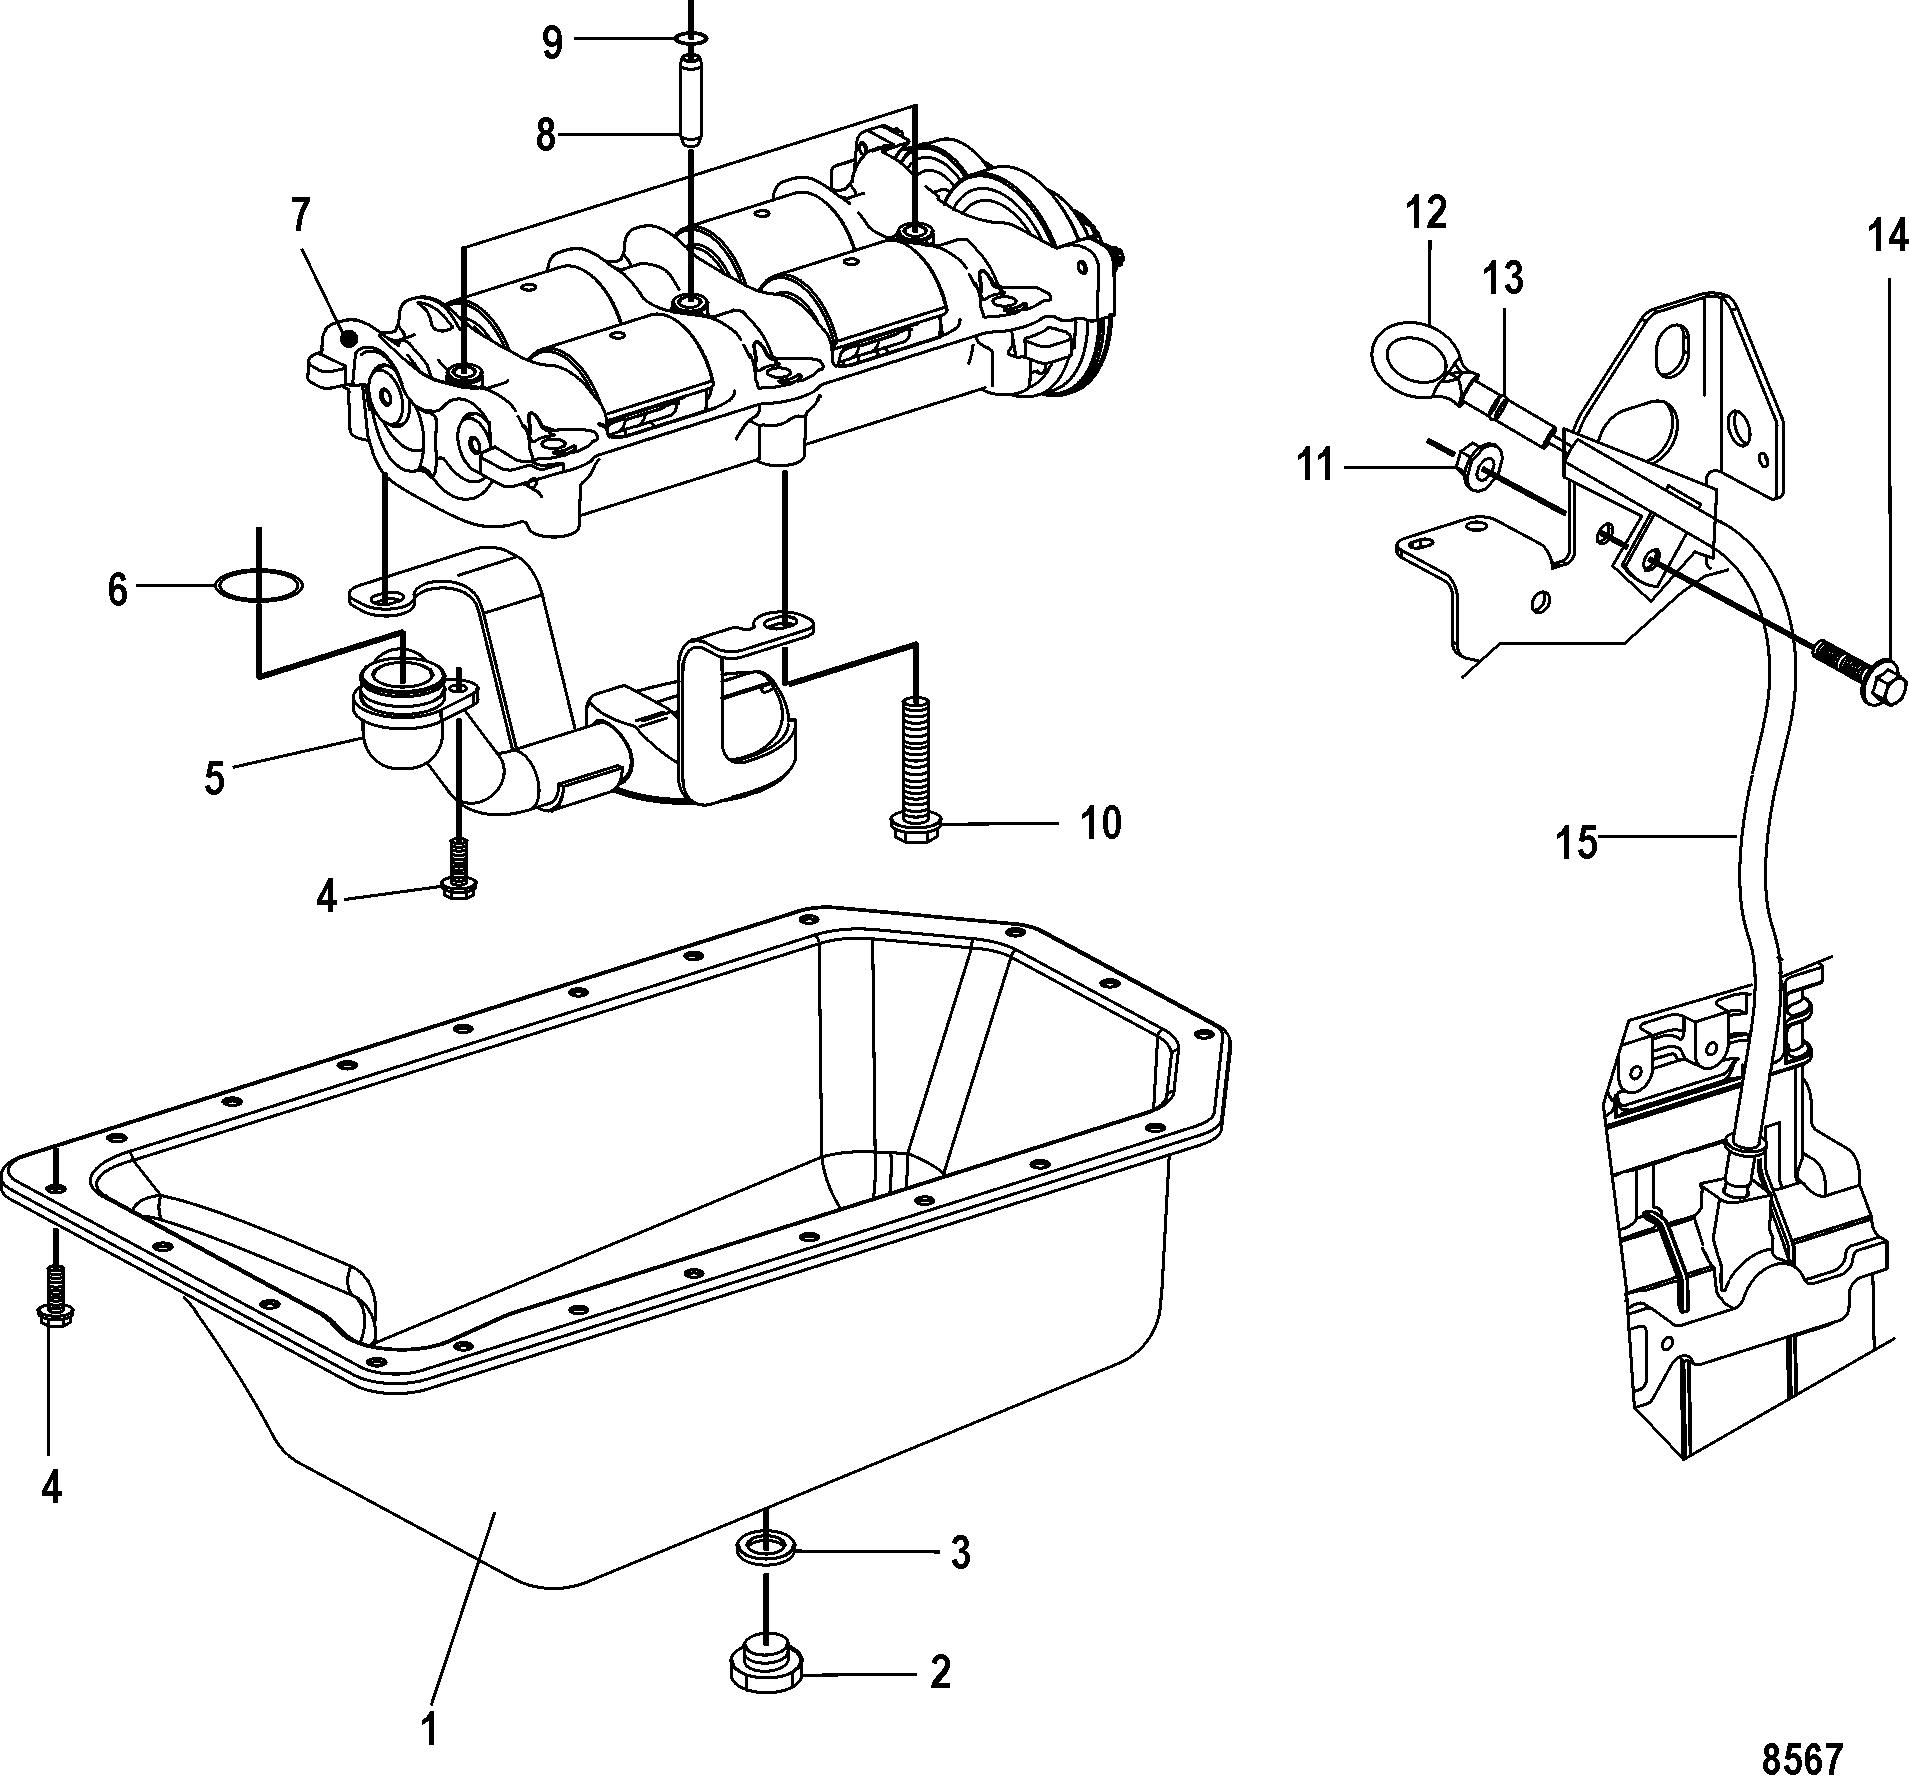 drain plug mercruiser outdrive parts diagram  diagram